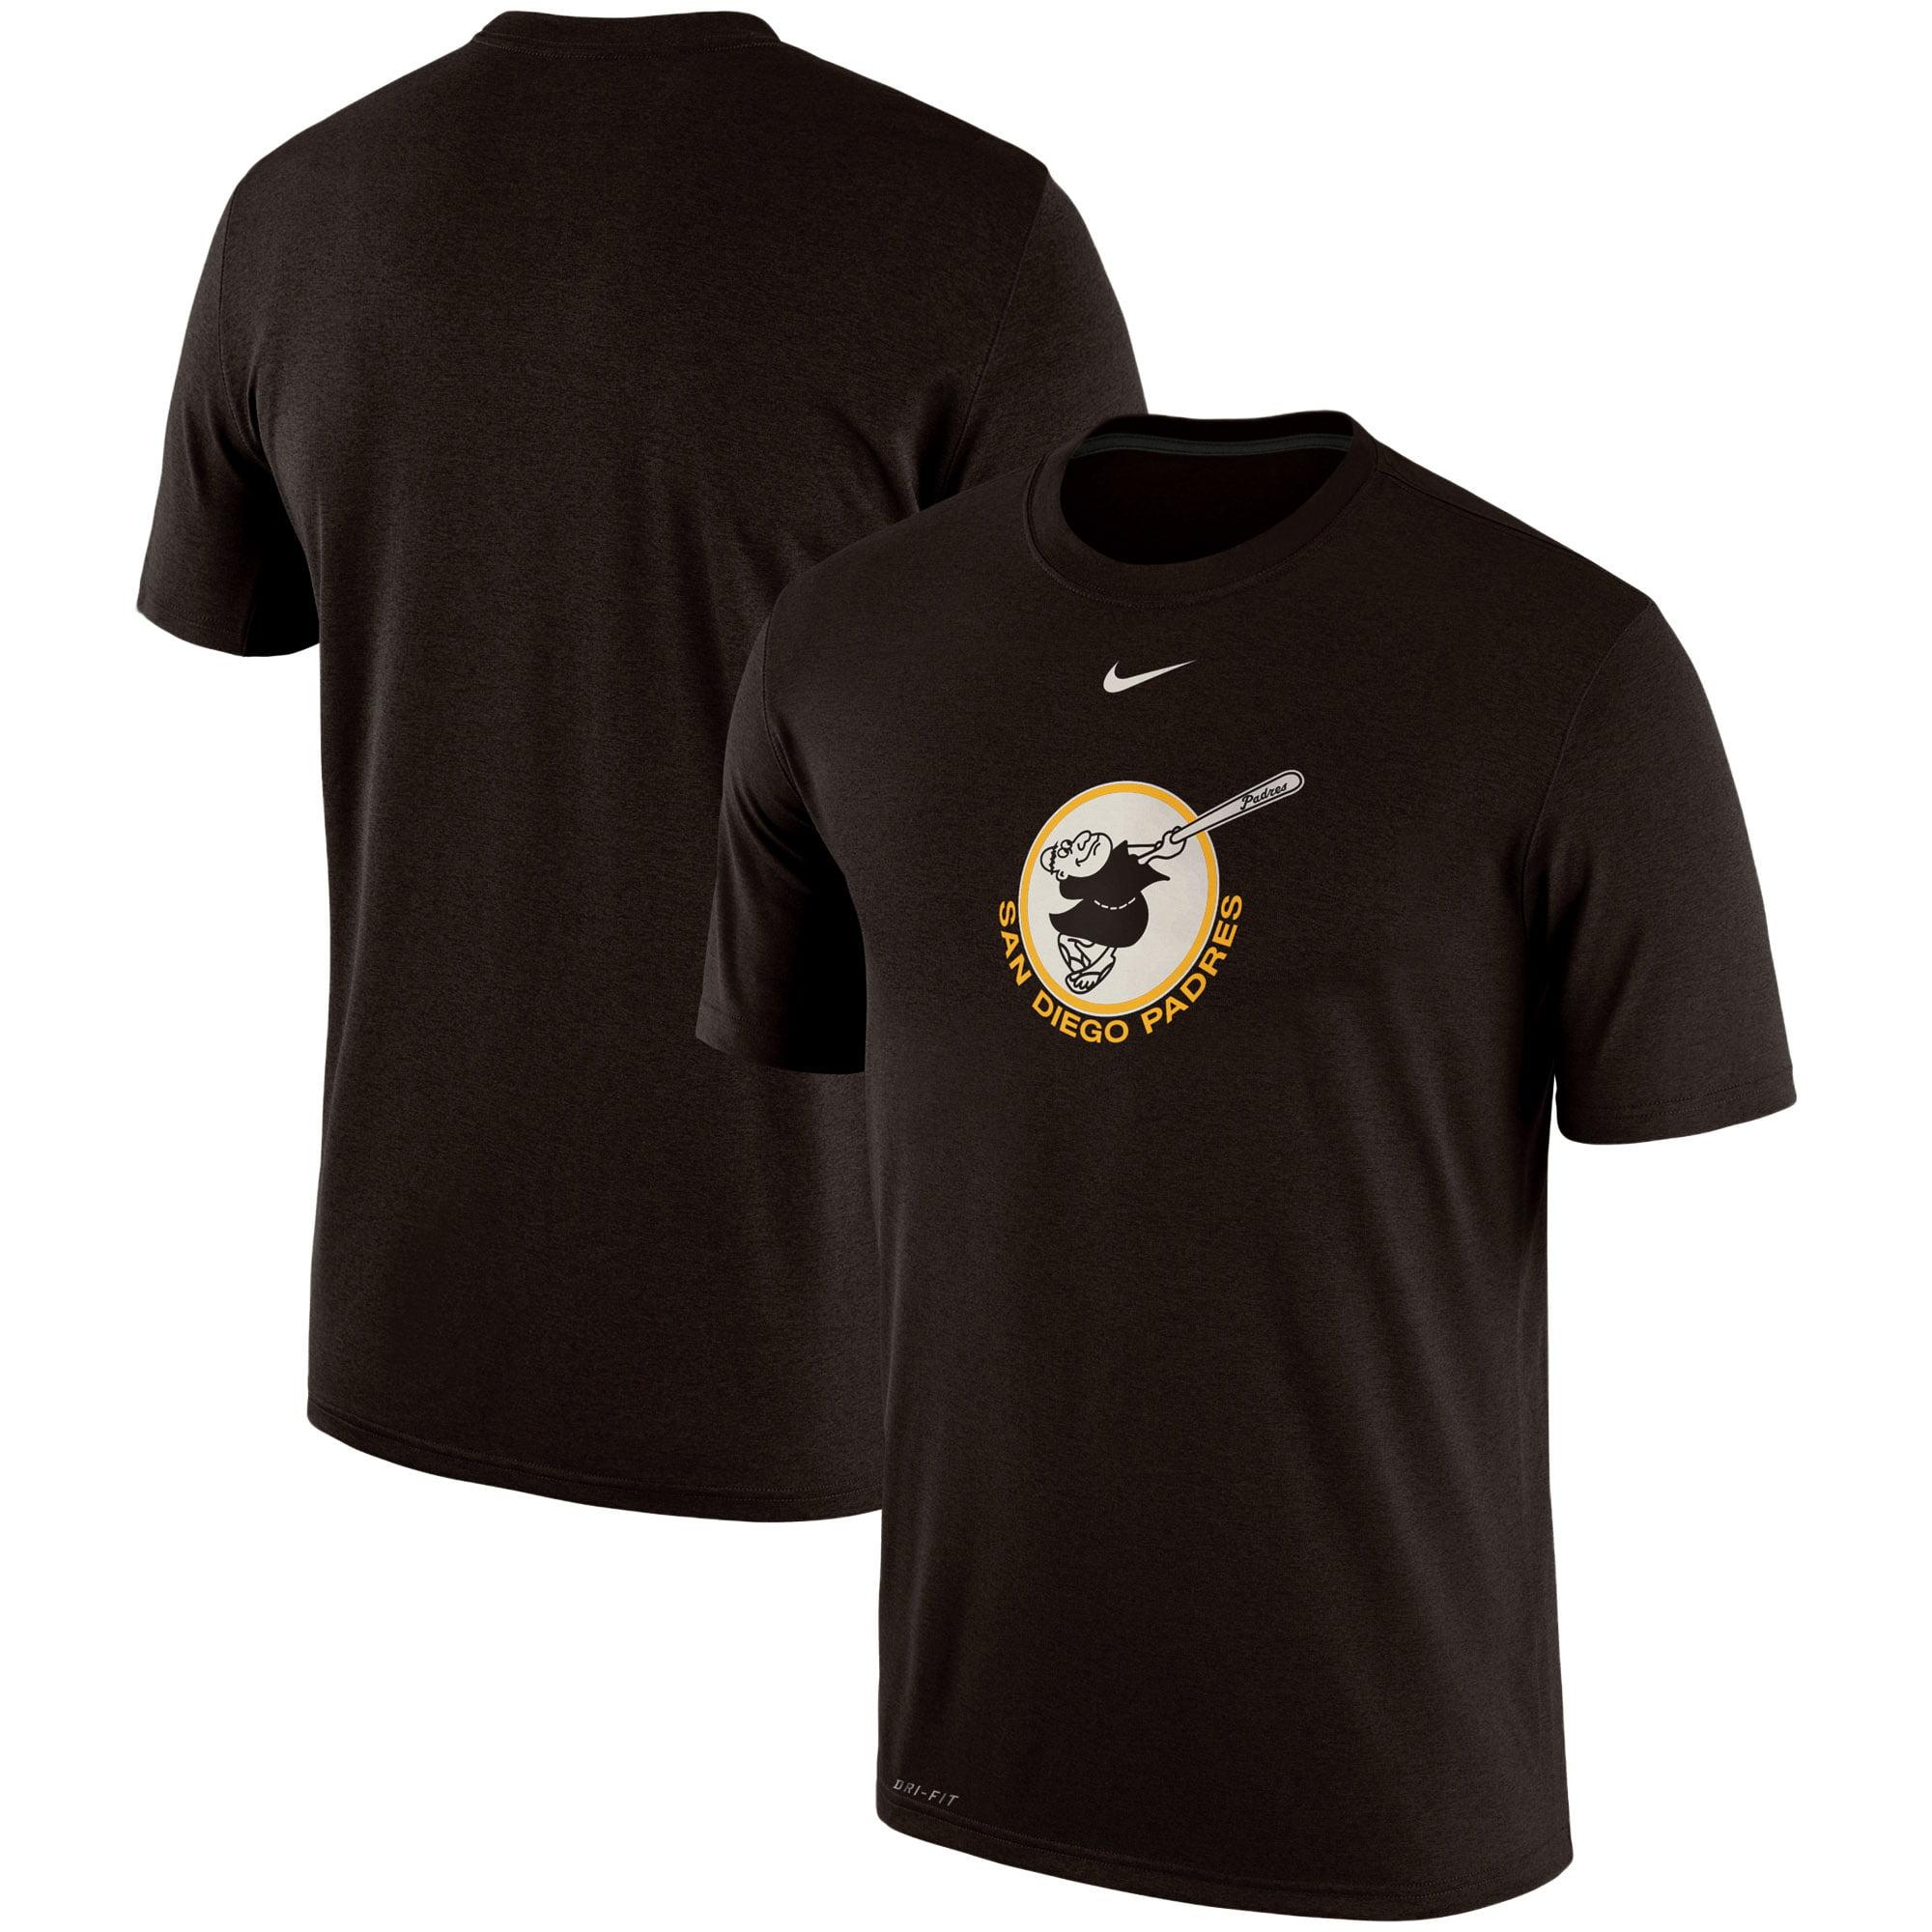 San Diego Padres Nike Batting Practice Logo Legend Performance T-Shirt - Brown